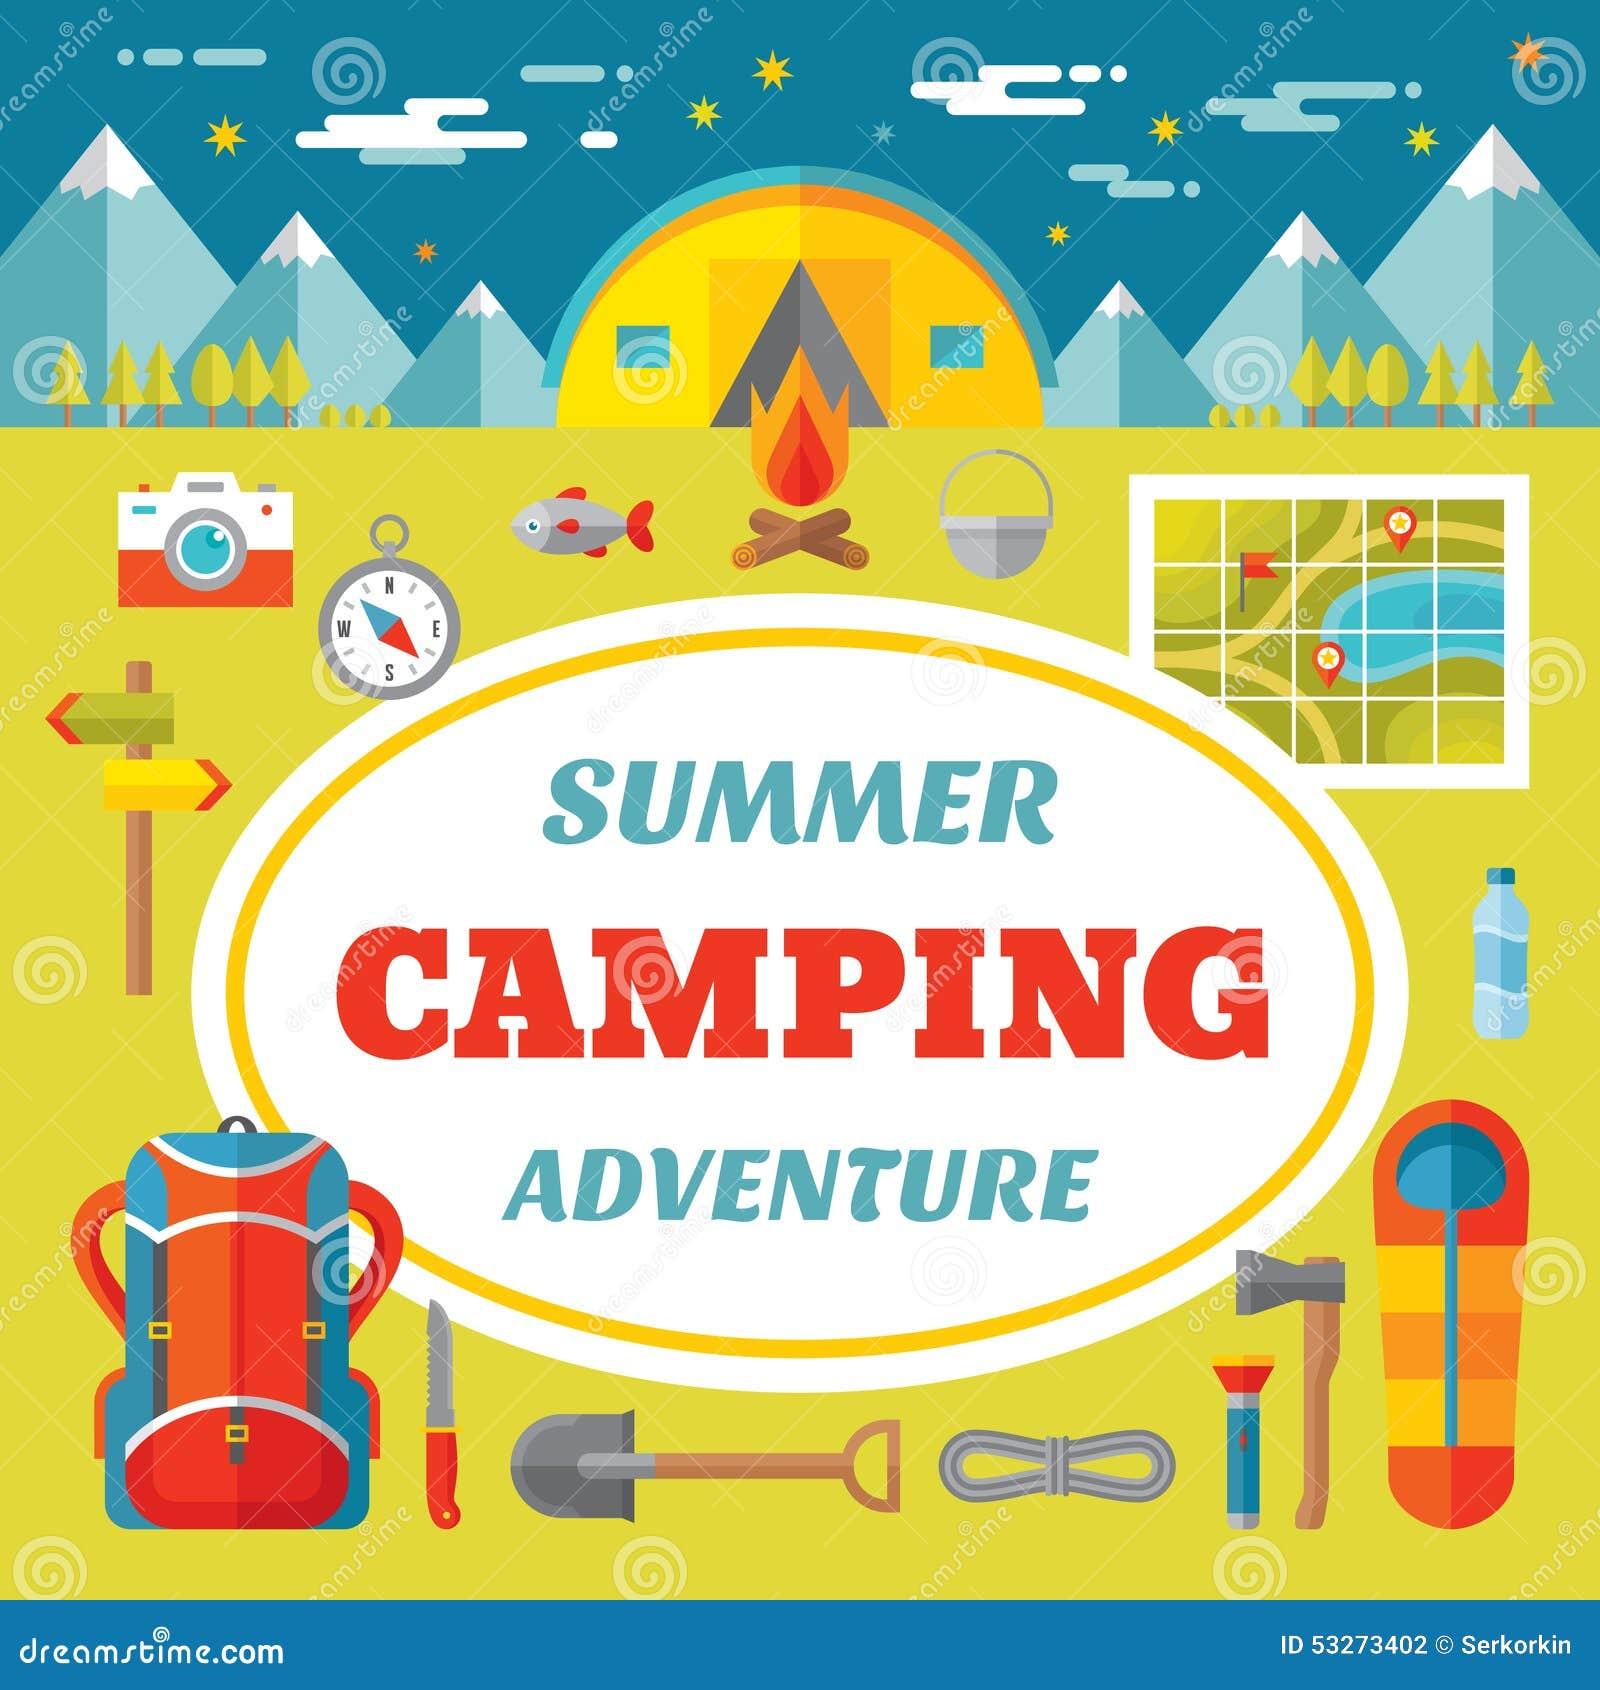 Summer Camping Adventure Creative Vector Banner In Flat